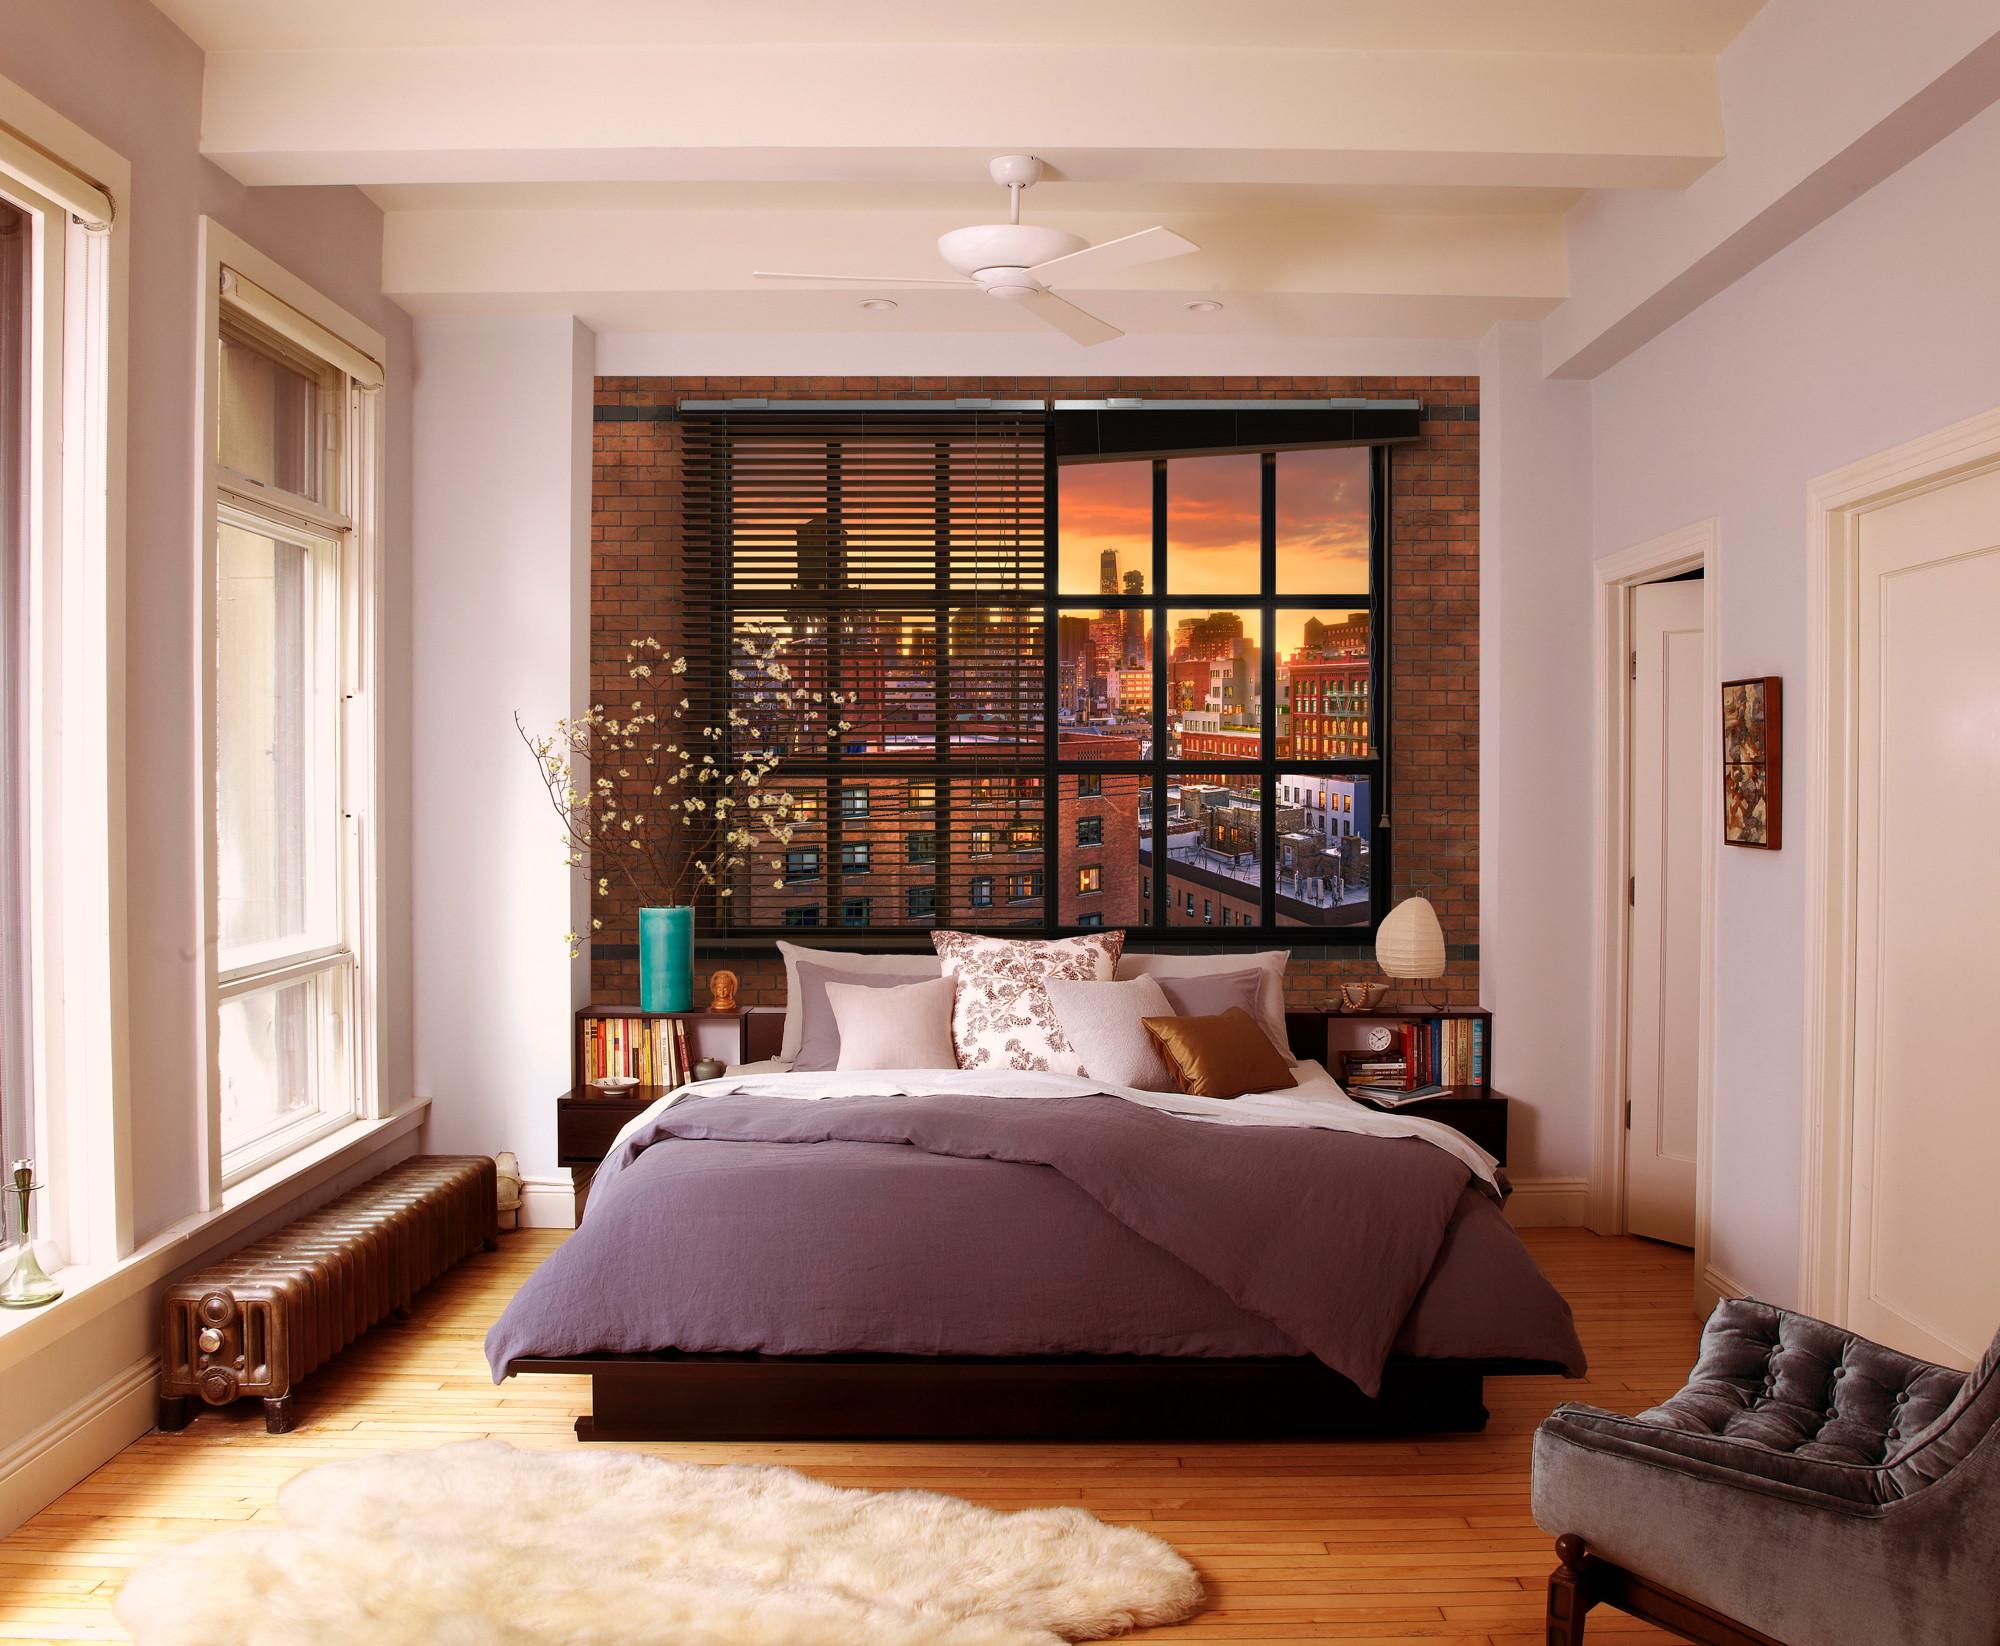 "Fototapete ""Brooklyn Brick"" (8-882) von Komar"